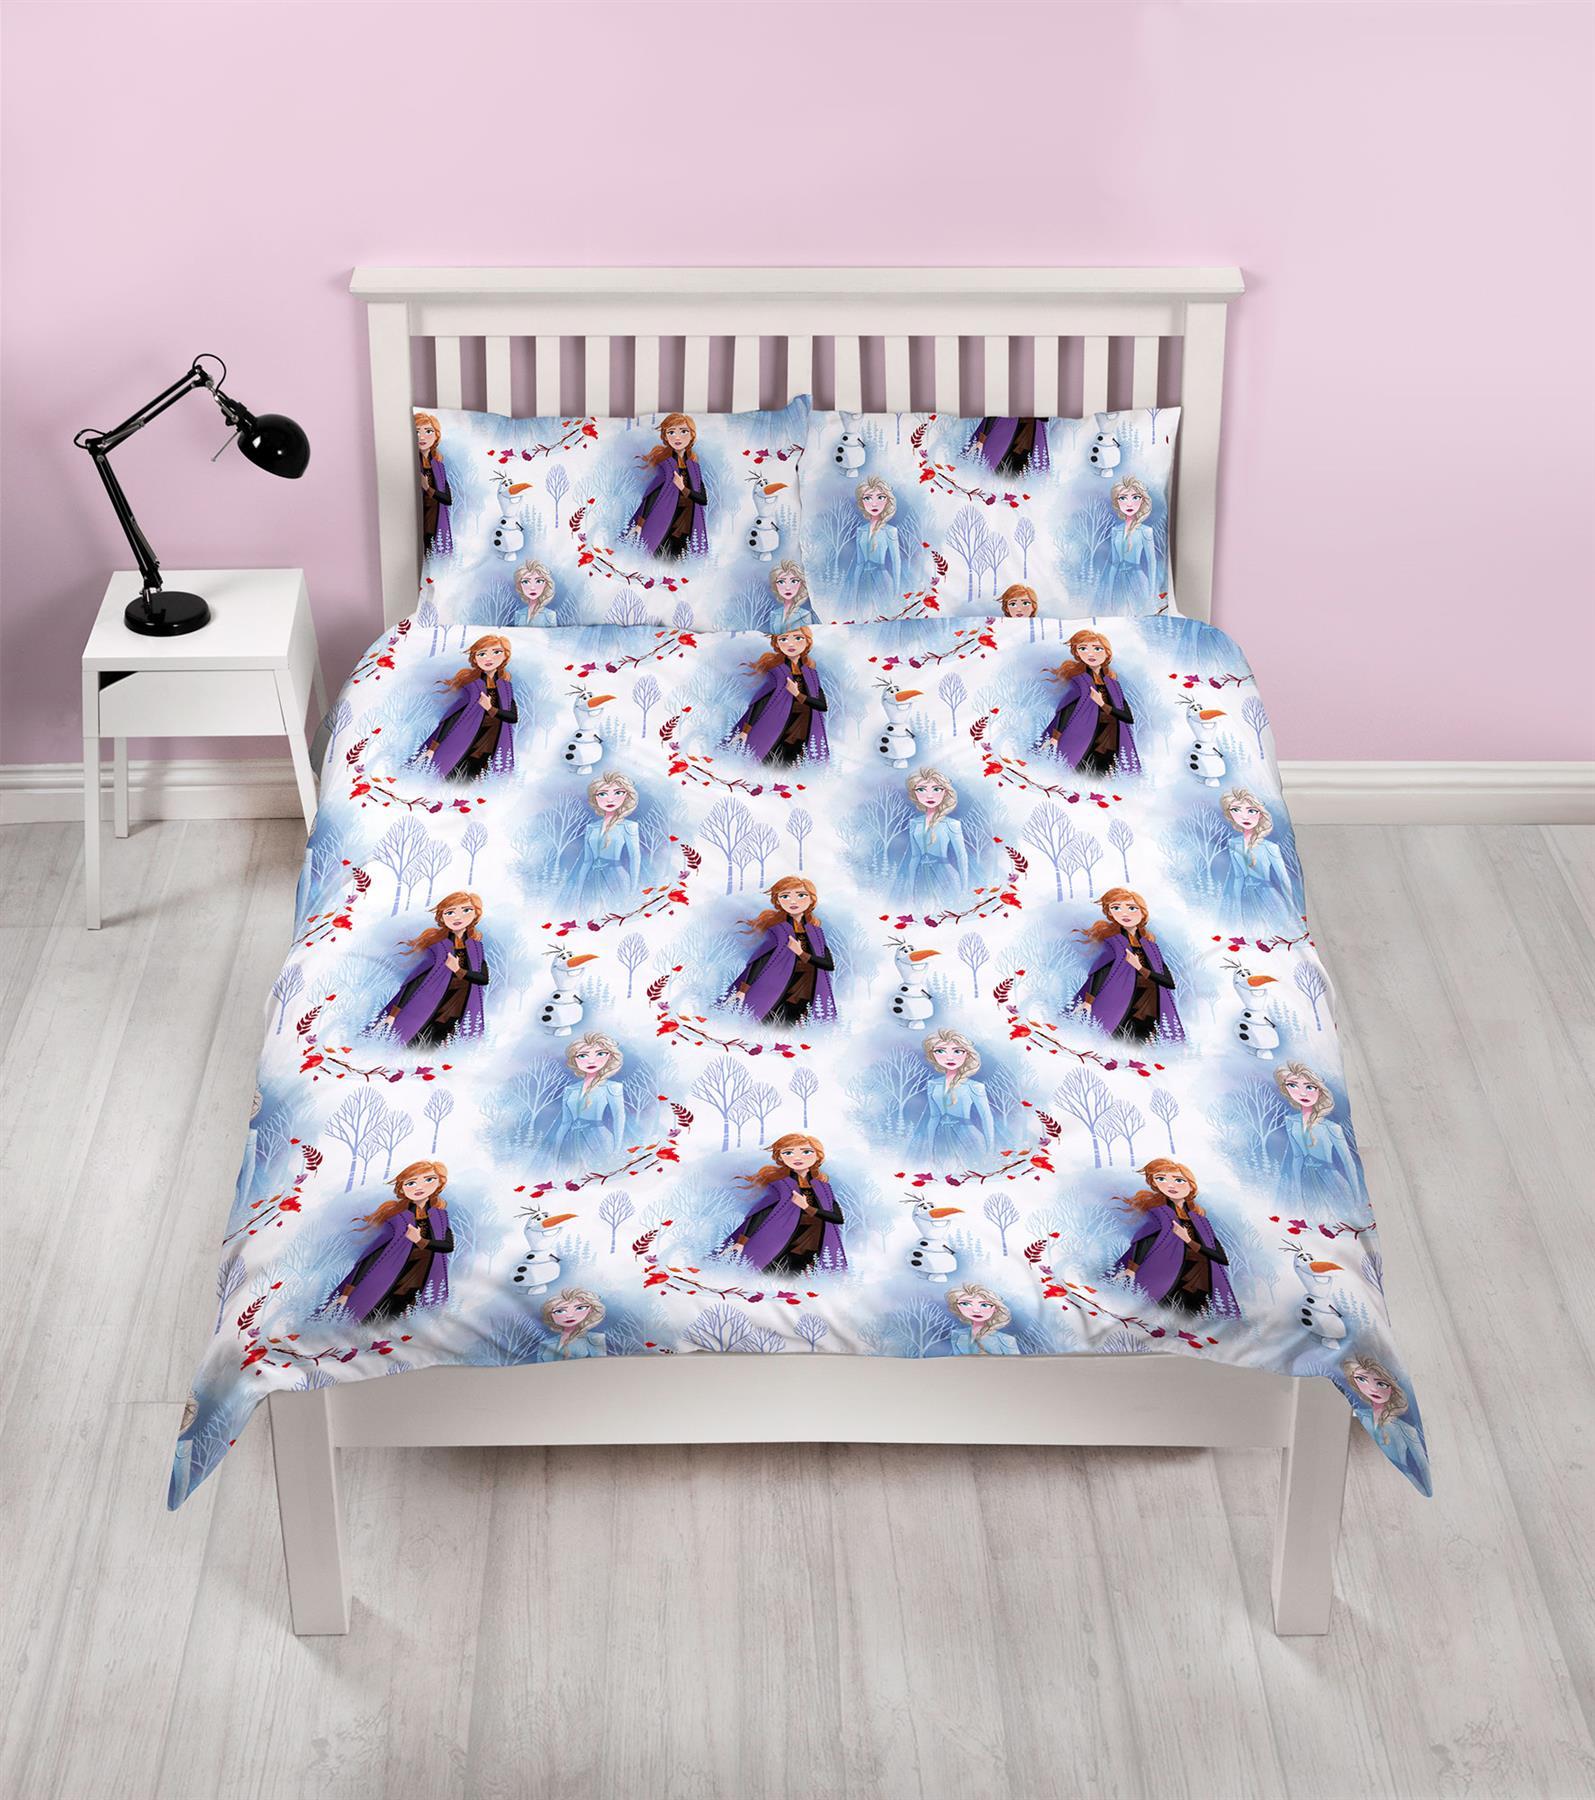 Official-Frozen-2-Duvet-Covers-Single-Double-Reversible-Bedding-Elsa-Anna-Olaf thumbnail 4